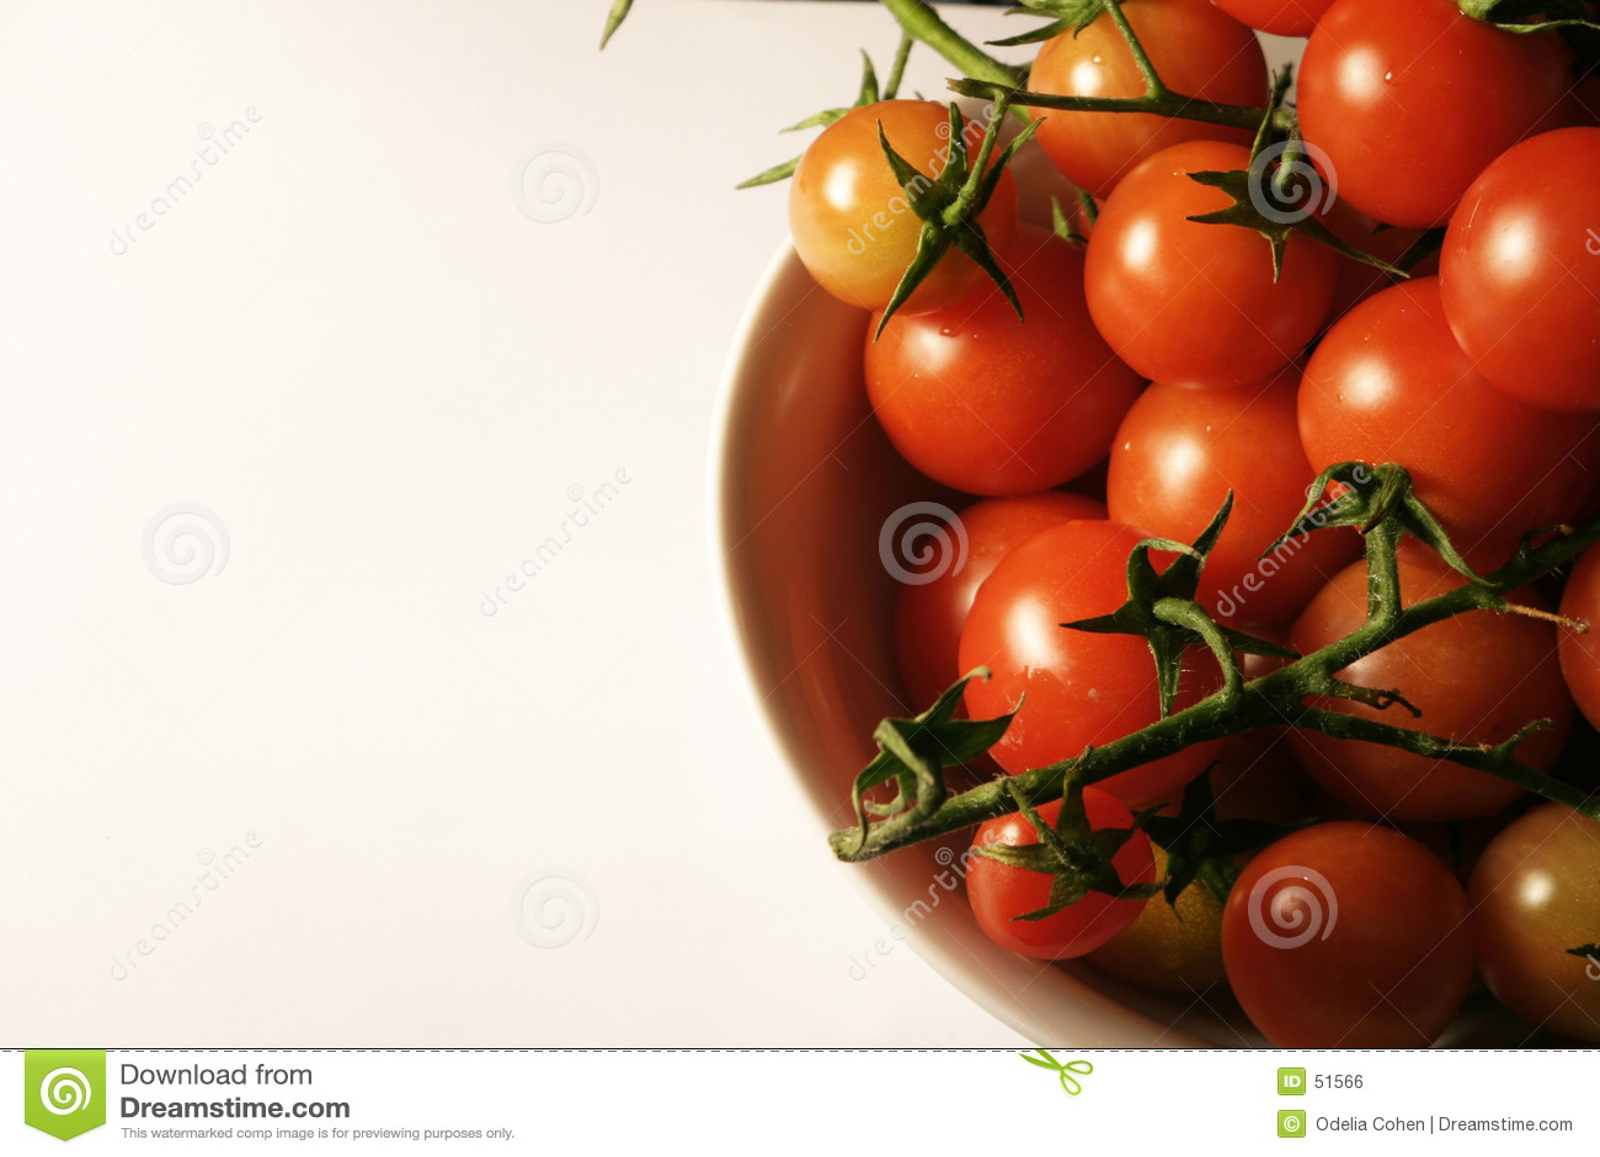 Download άμπελος ντοματών κερασιών στοκ εικόνες. εικόνα από ντομάτες - 51566